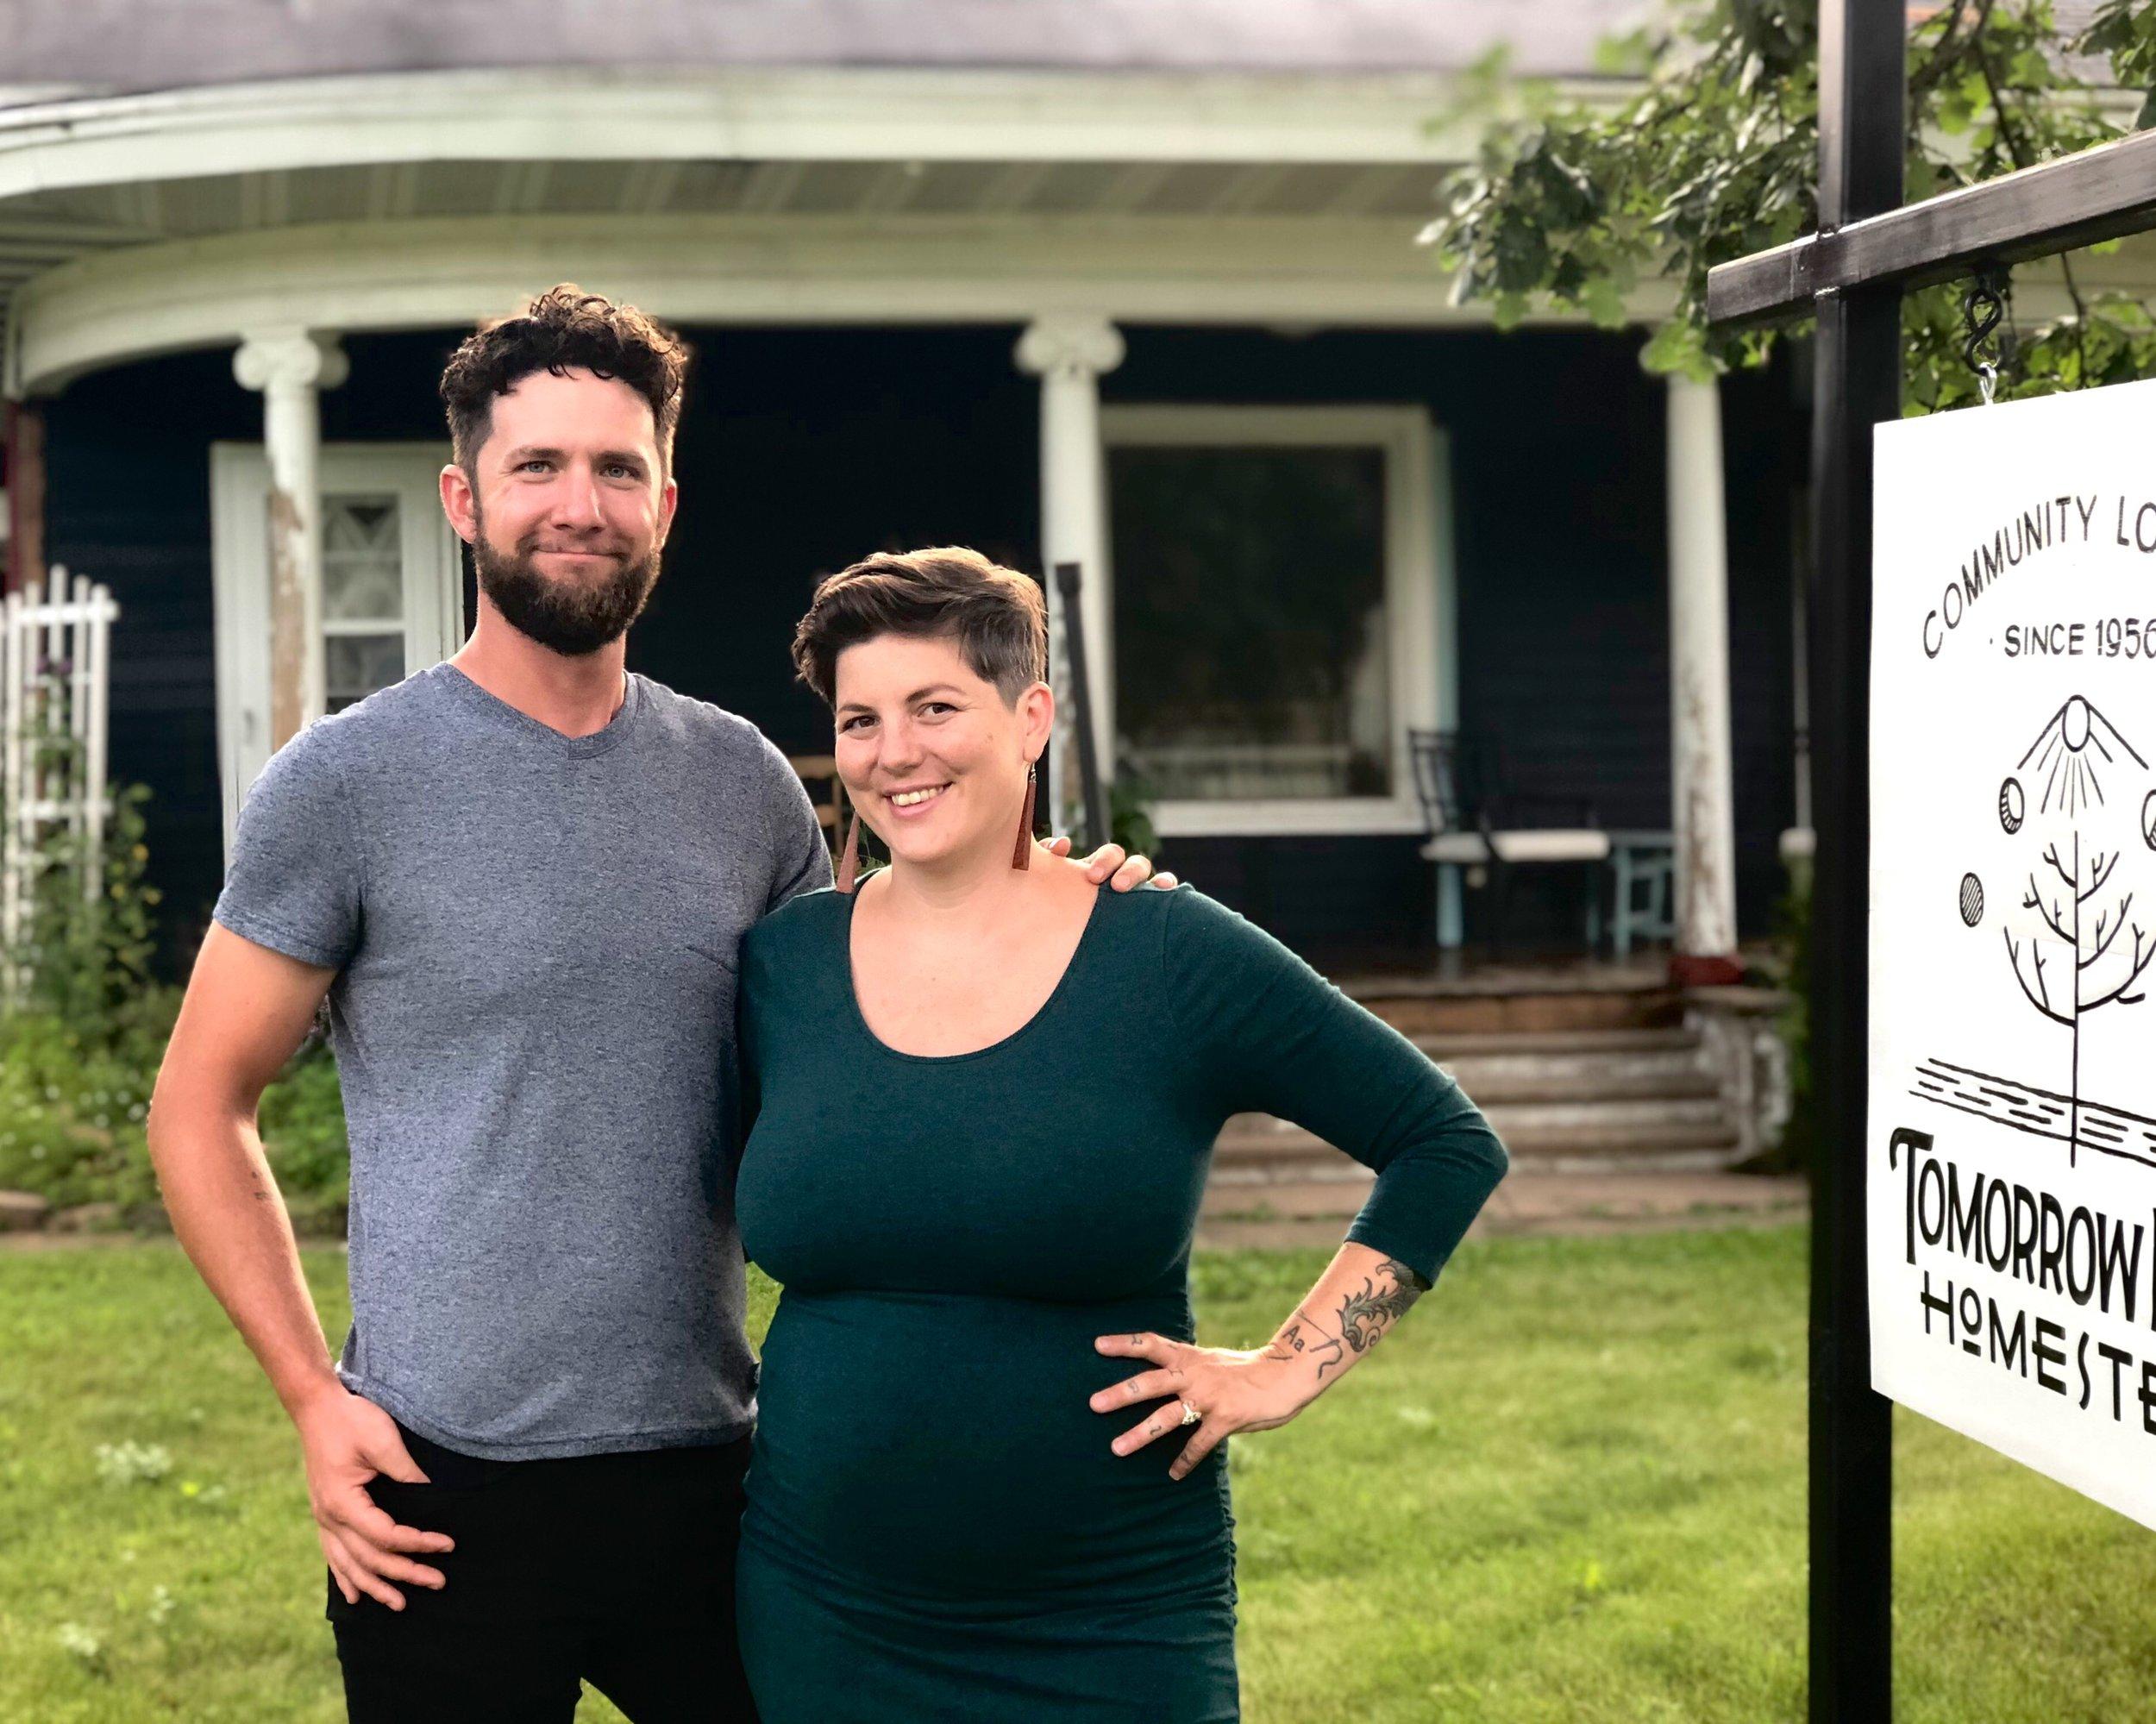 Isiah Miller and Rubina Martini — Owners of Tomorrow River Homestead